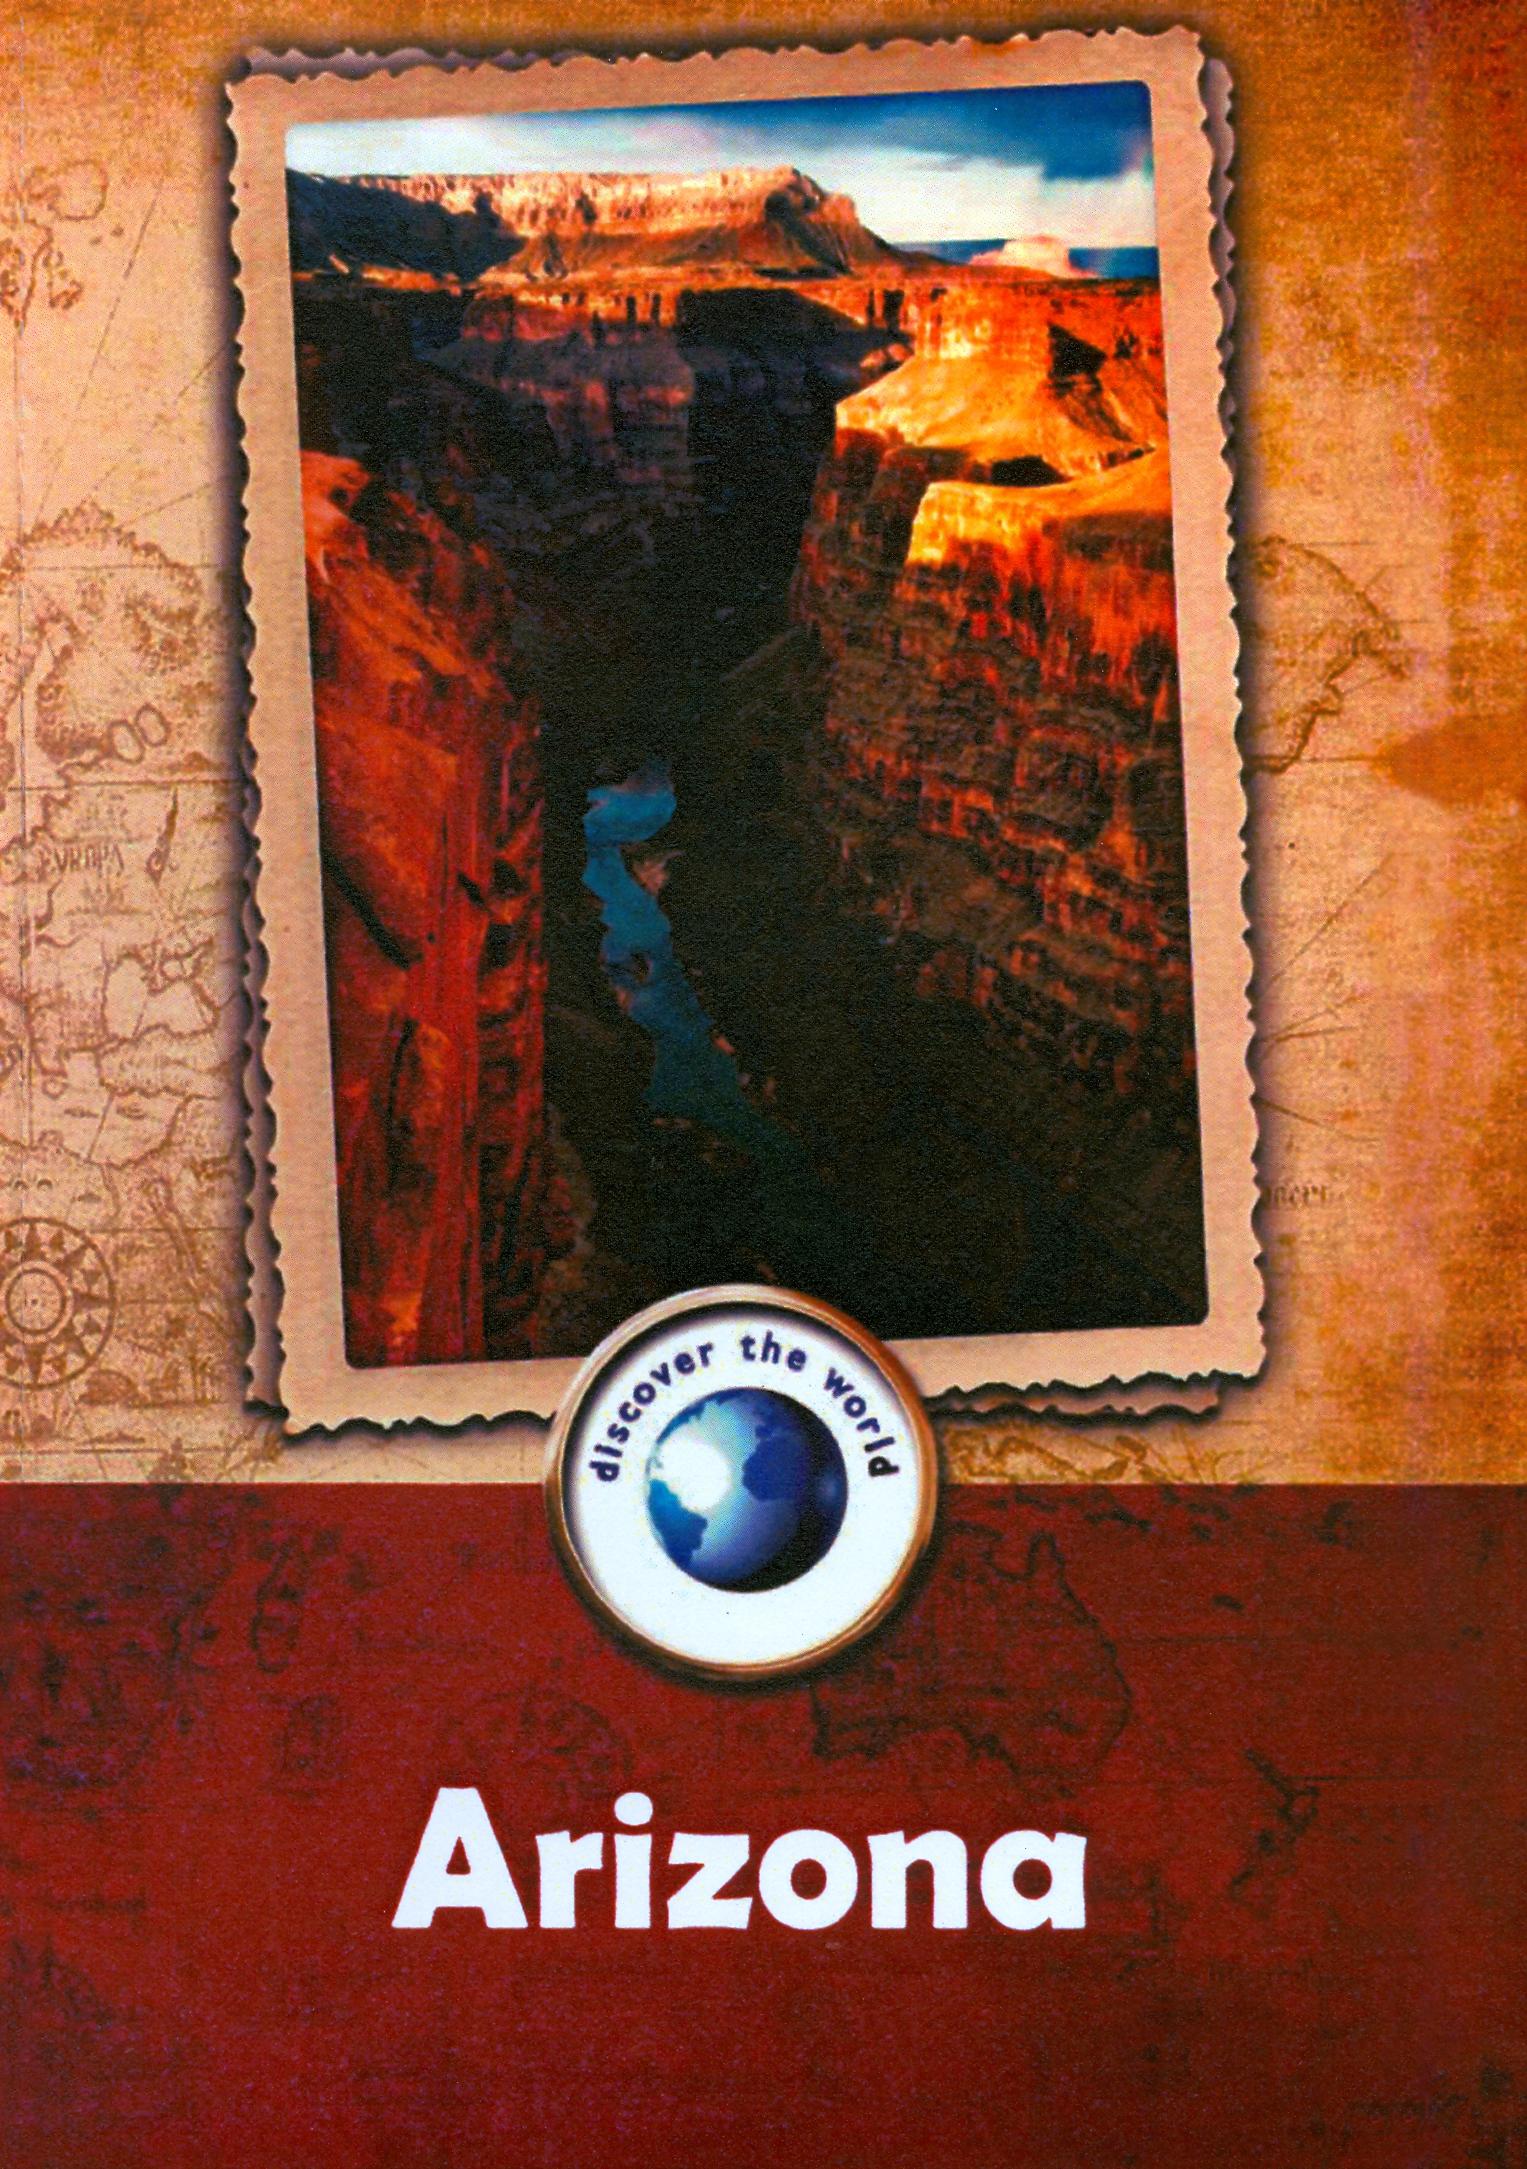 Discover the World: Arizona